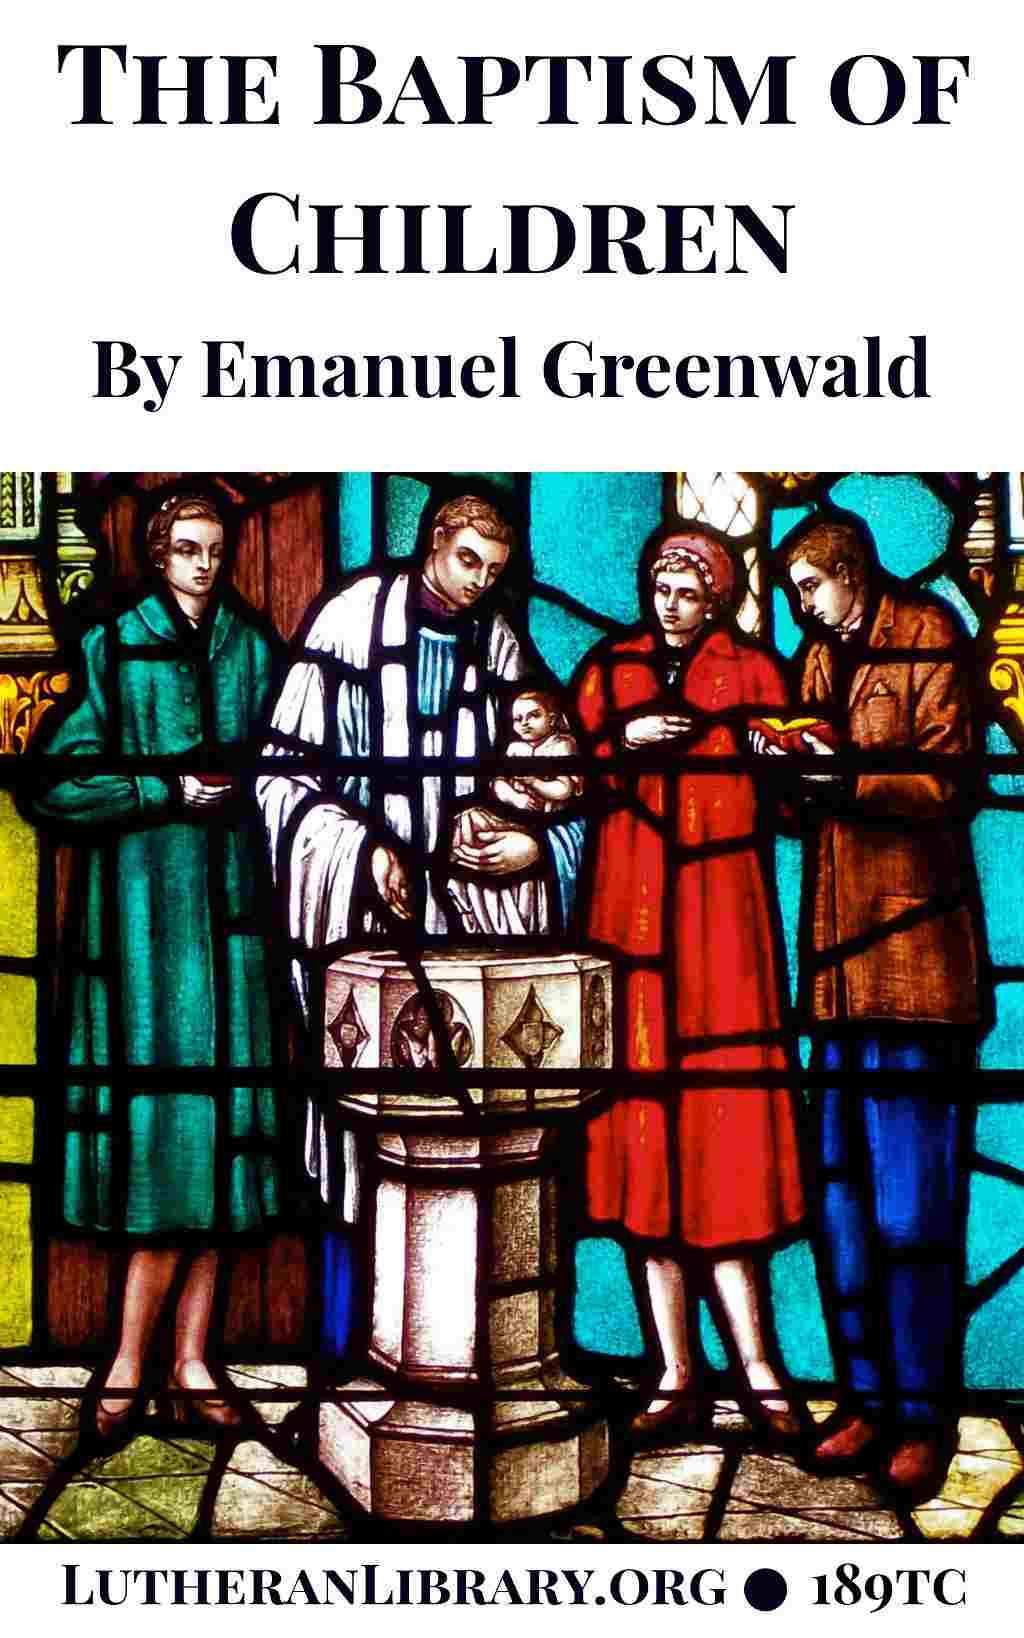 The Baptism of Children by Emanuel Greenwald